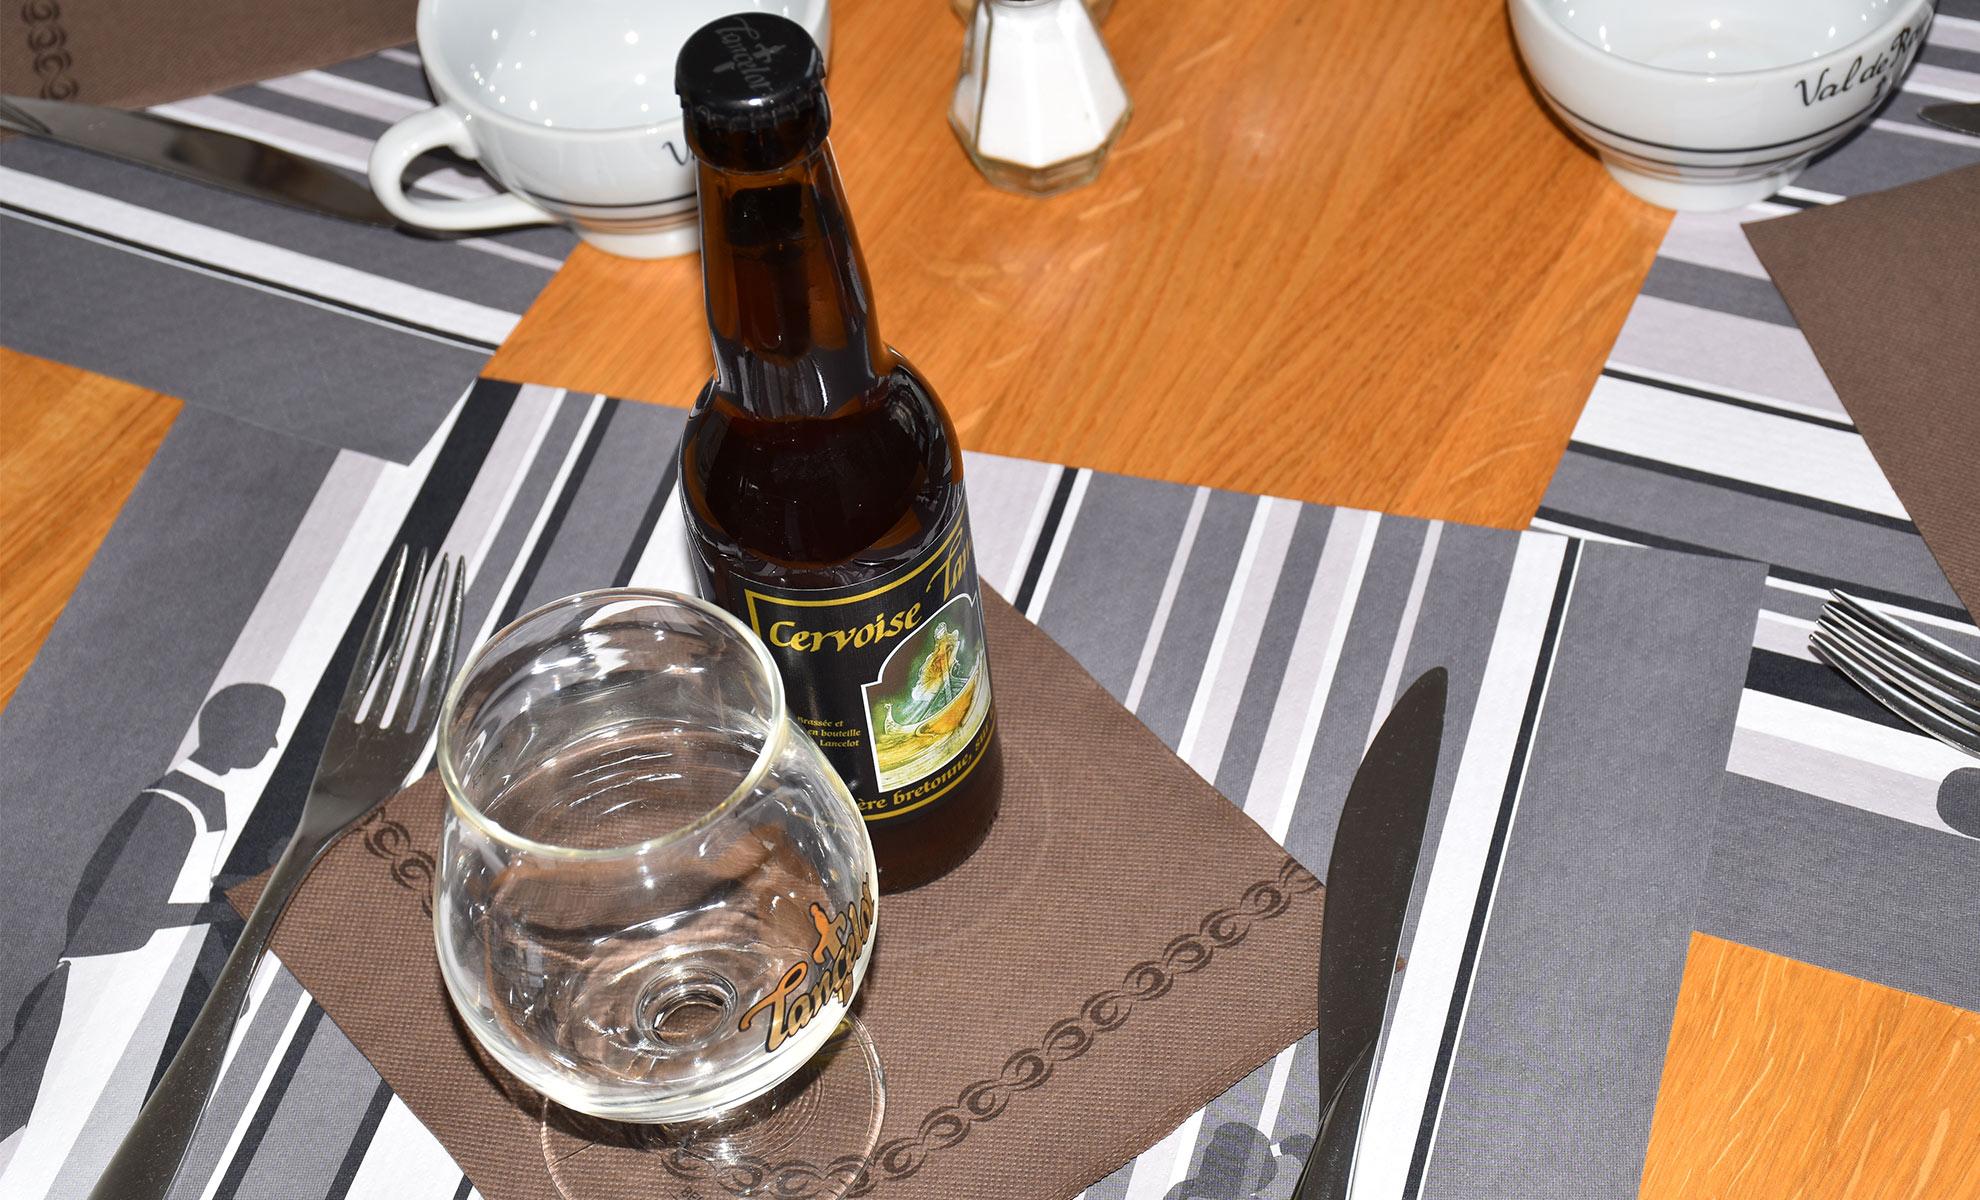 Bière bretonne artisanale